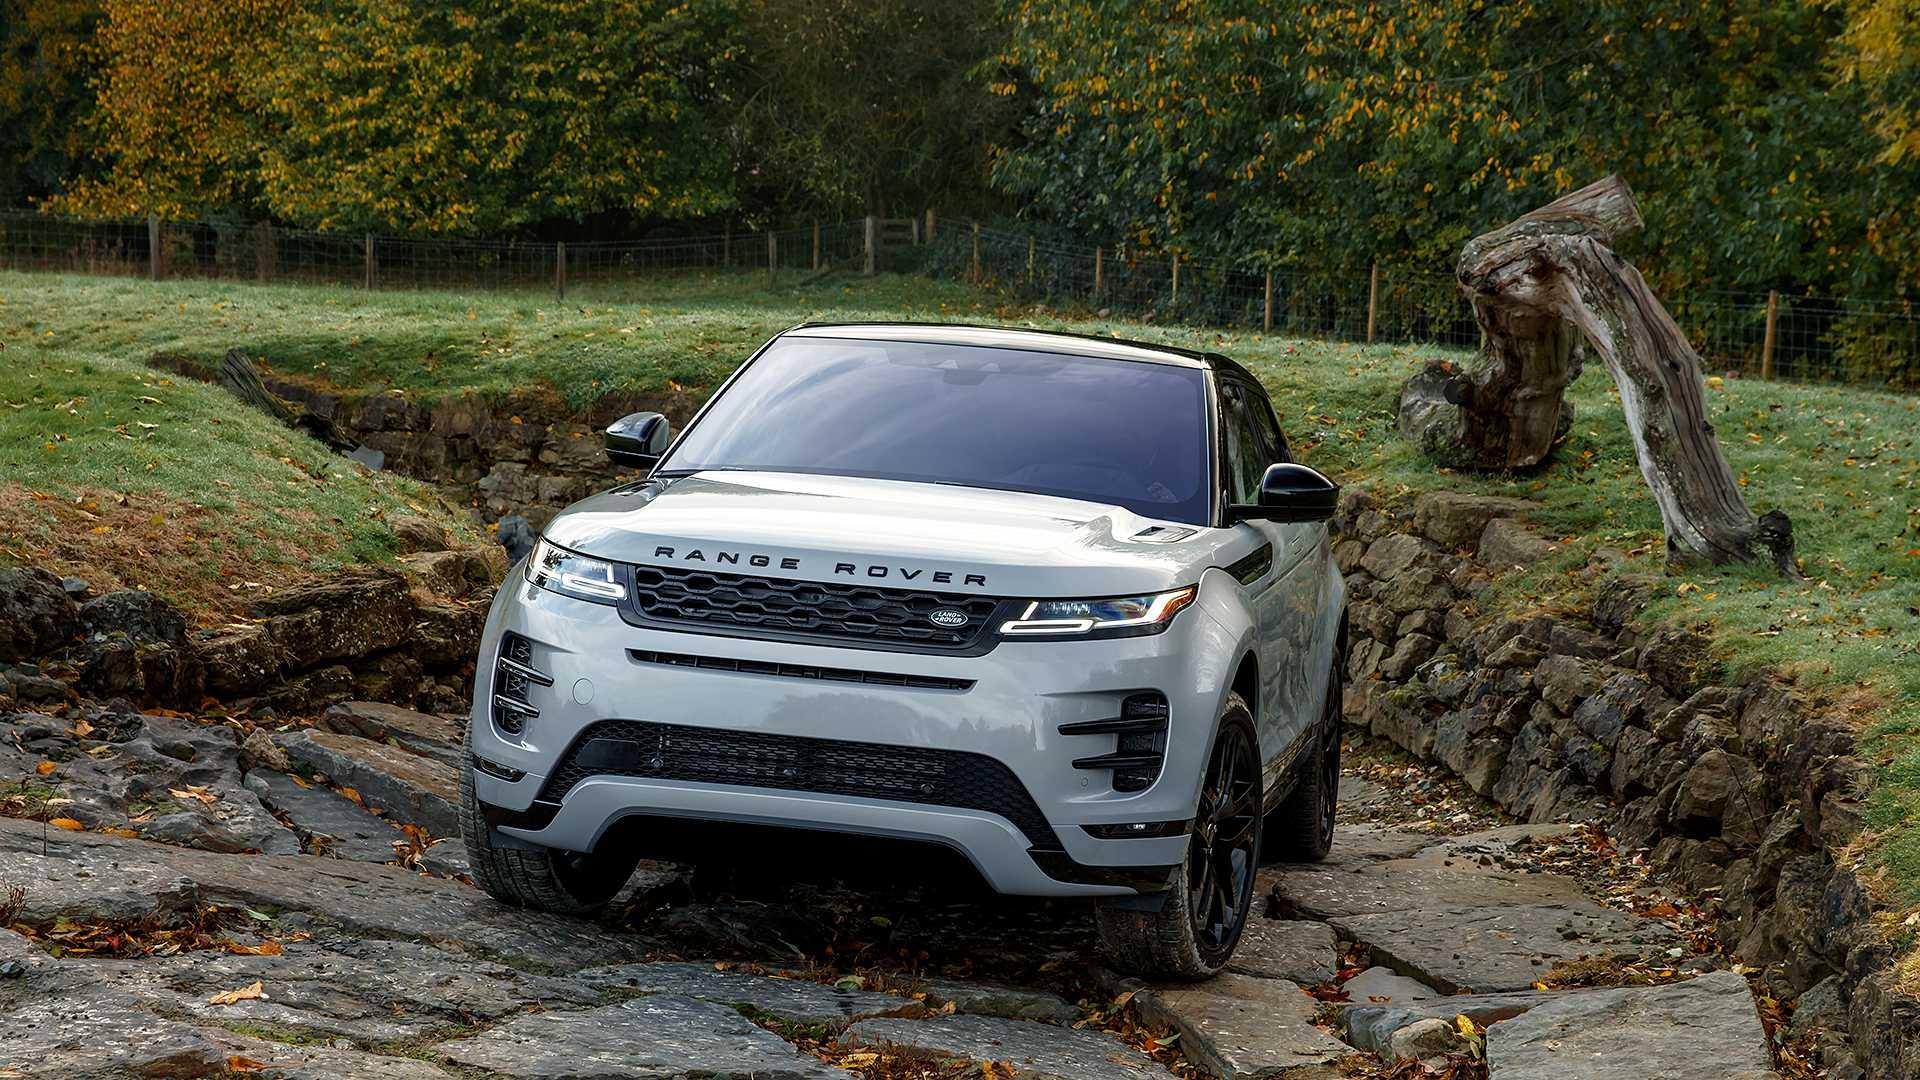 2020-range-rover-evoque (11)